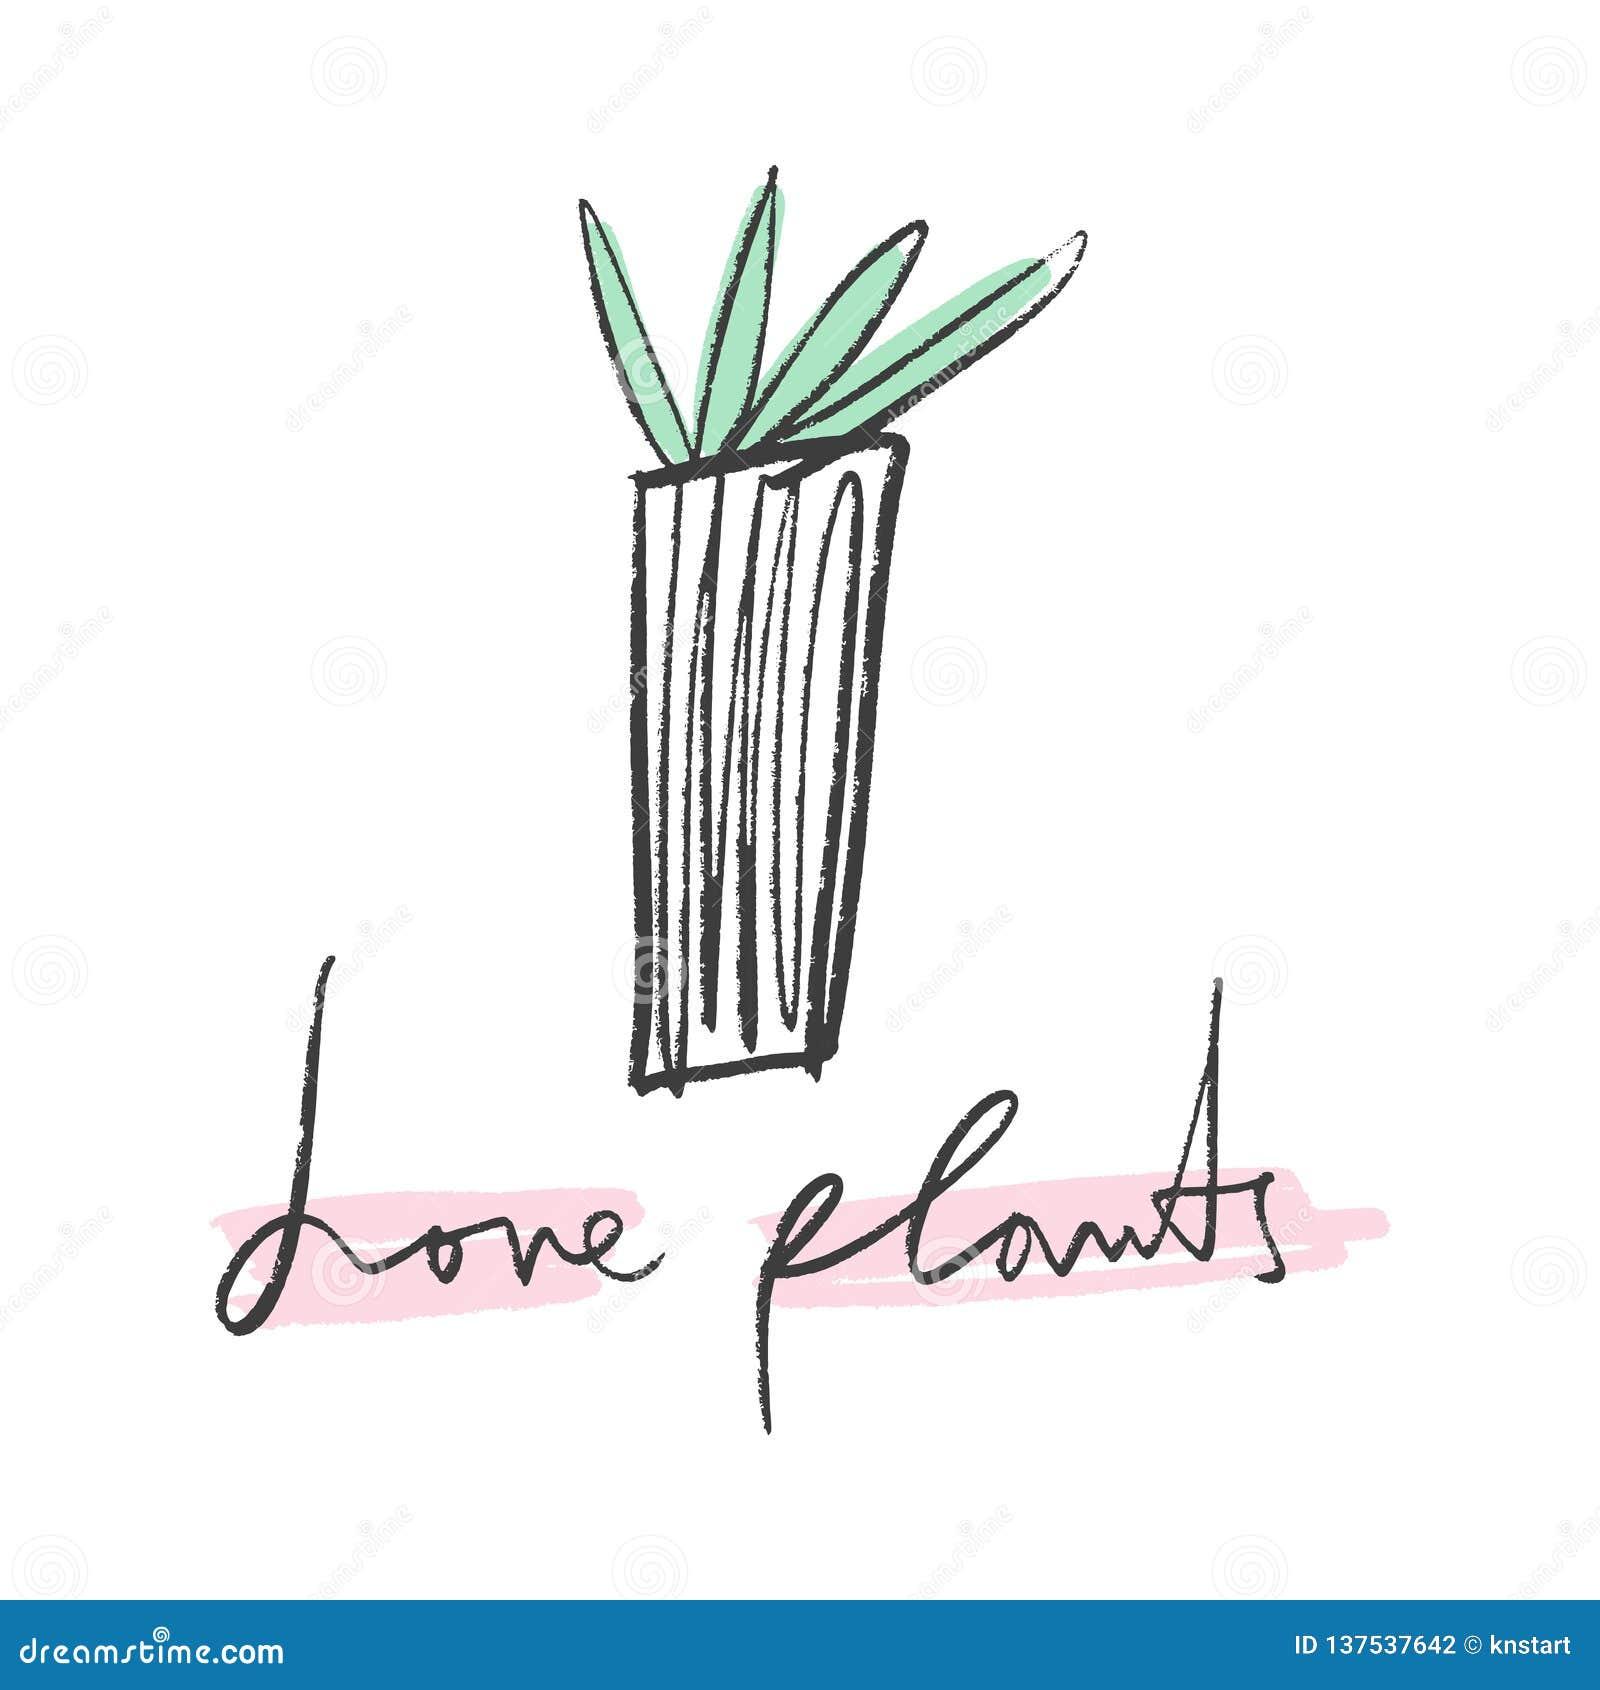 House plants in color, hand drawn illustration. Interior design